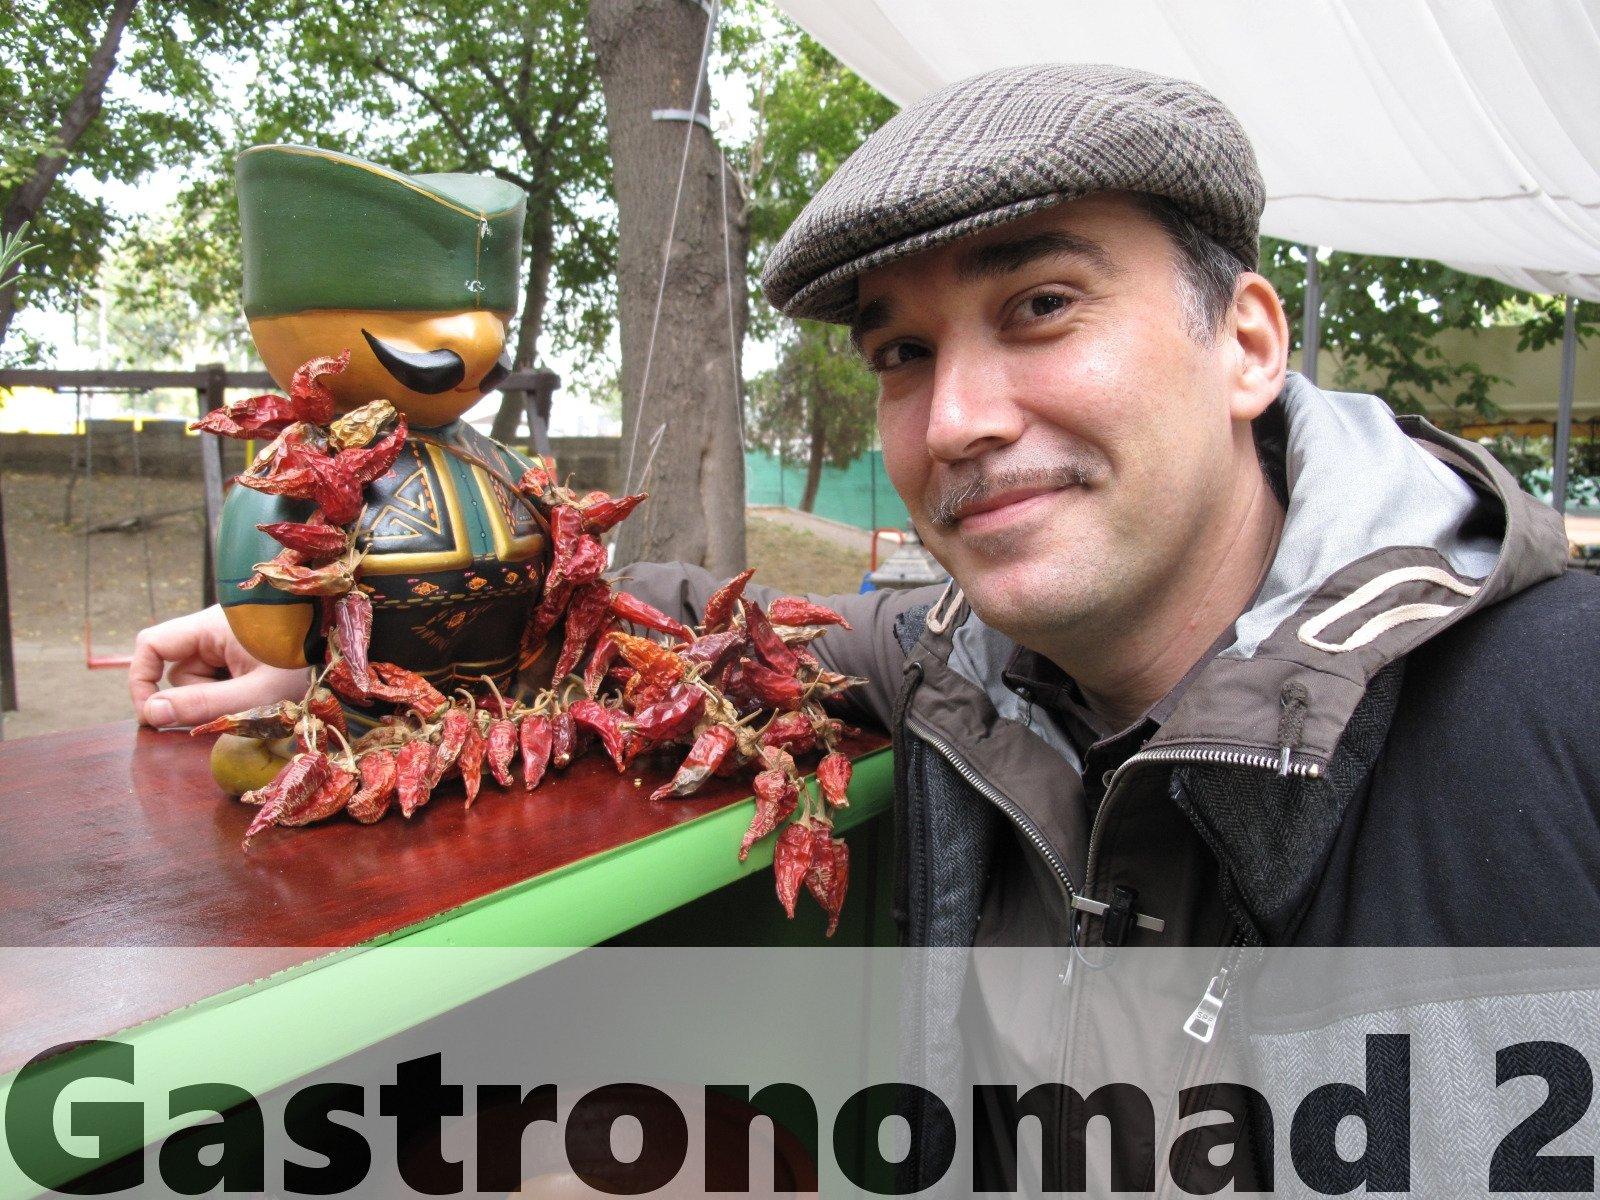 Gastronomad 2 - Season 2